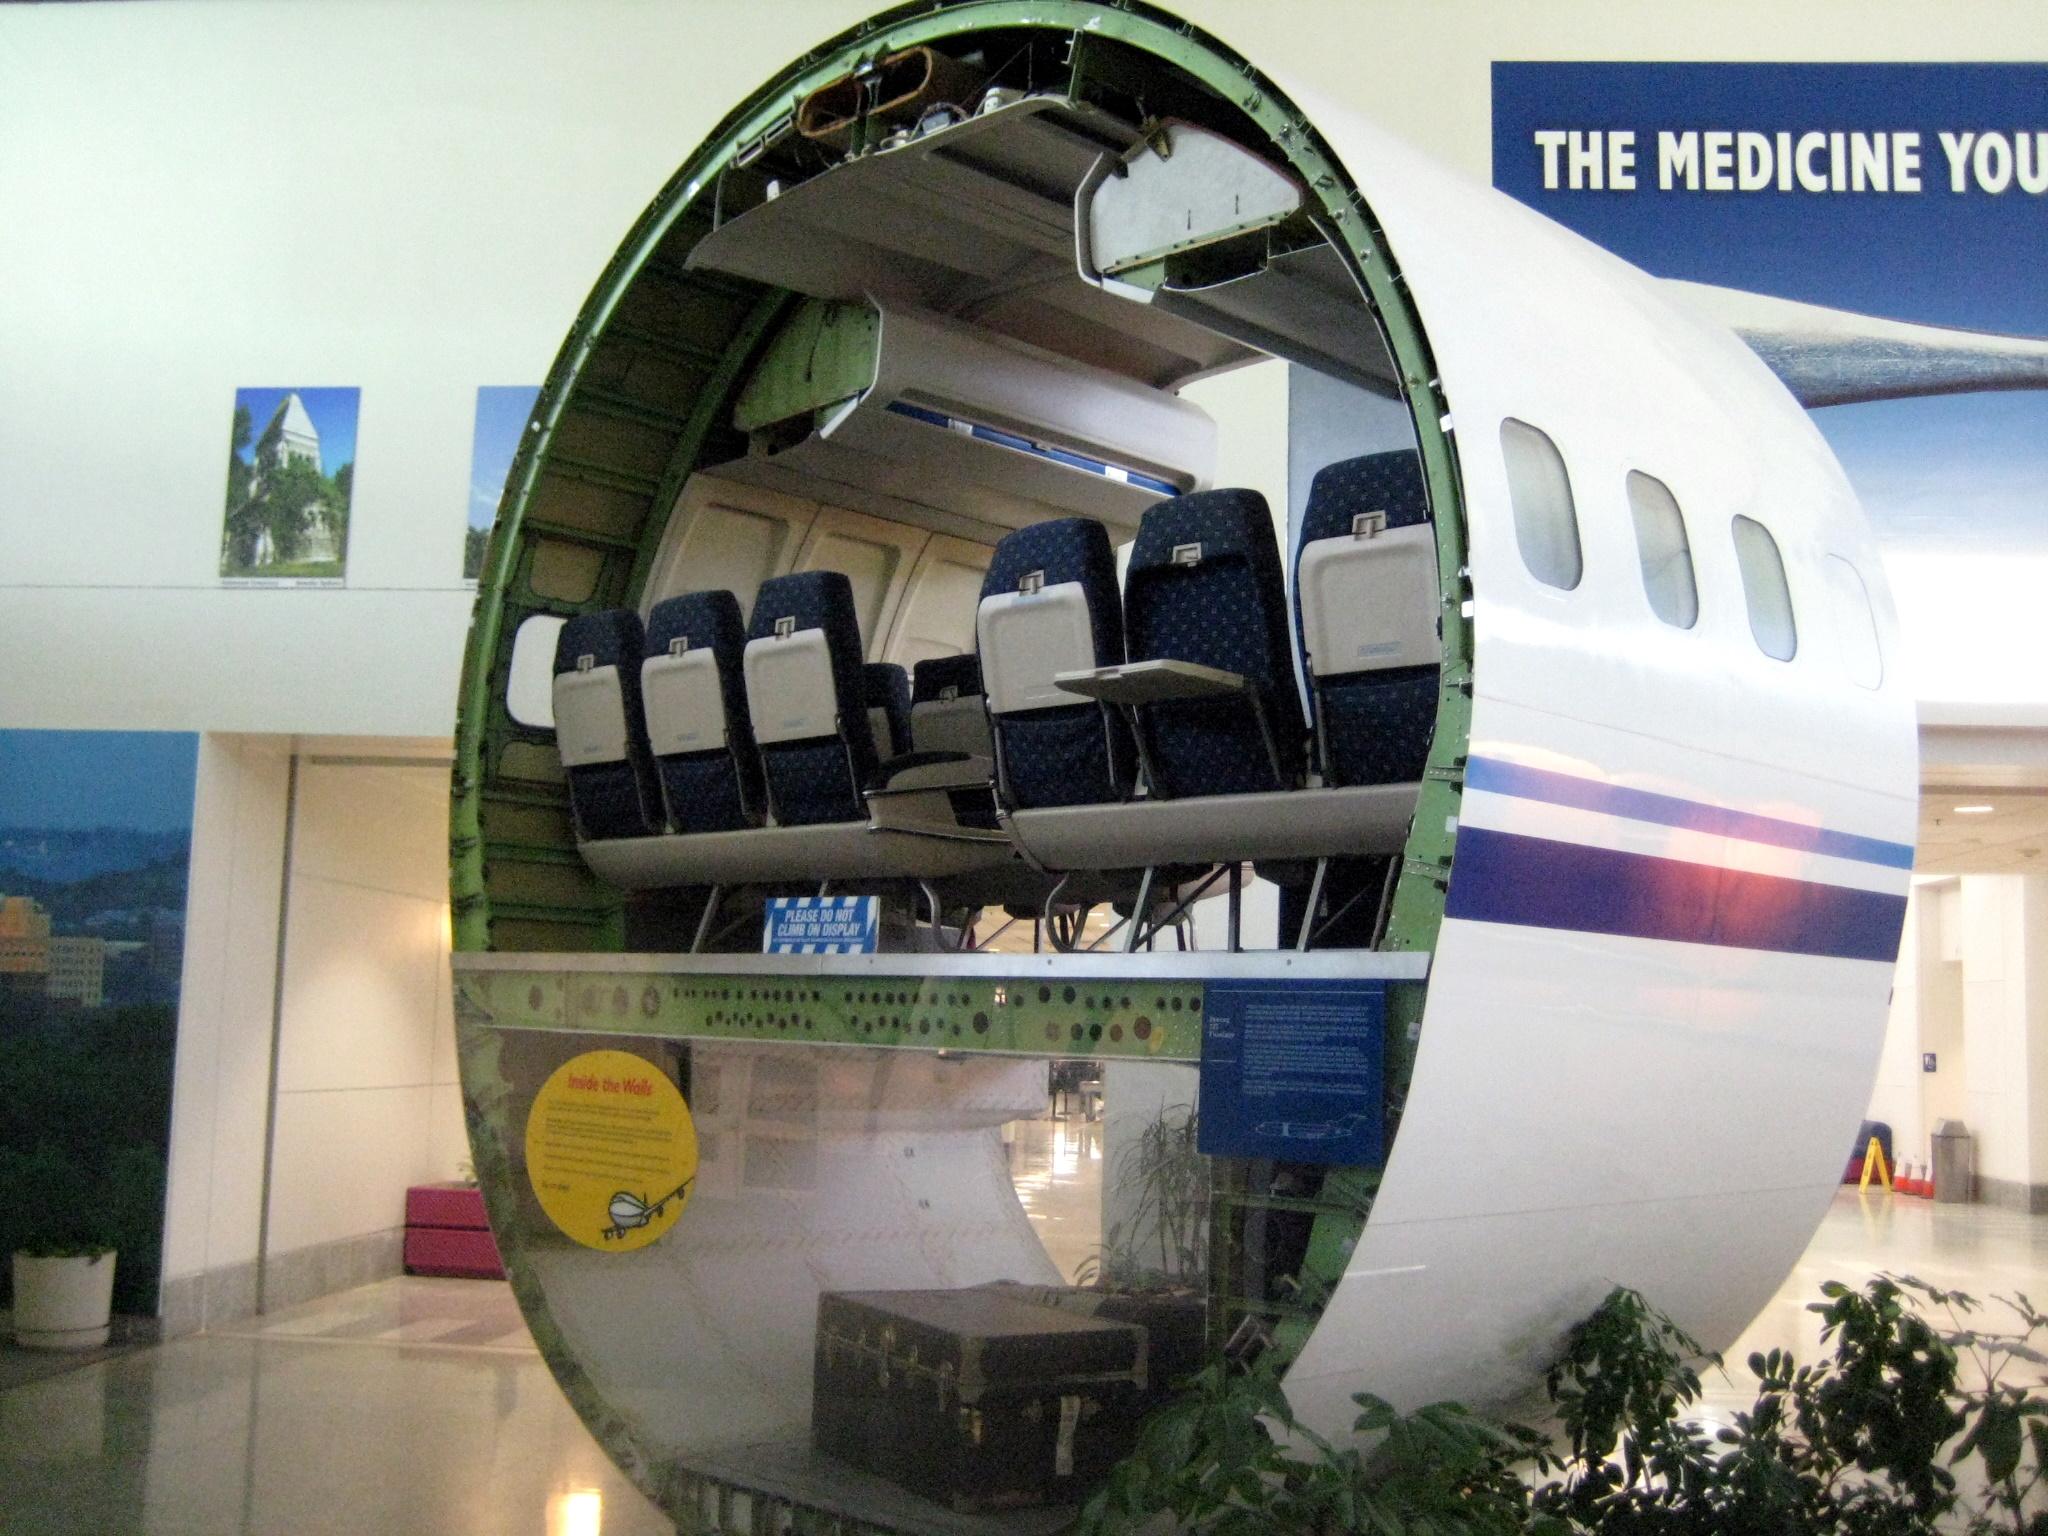 Dark Roasted Blend Abandoned Boeing 747 Restaurant and